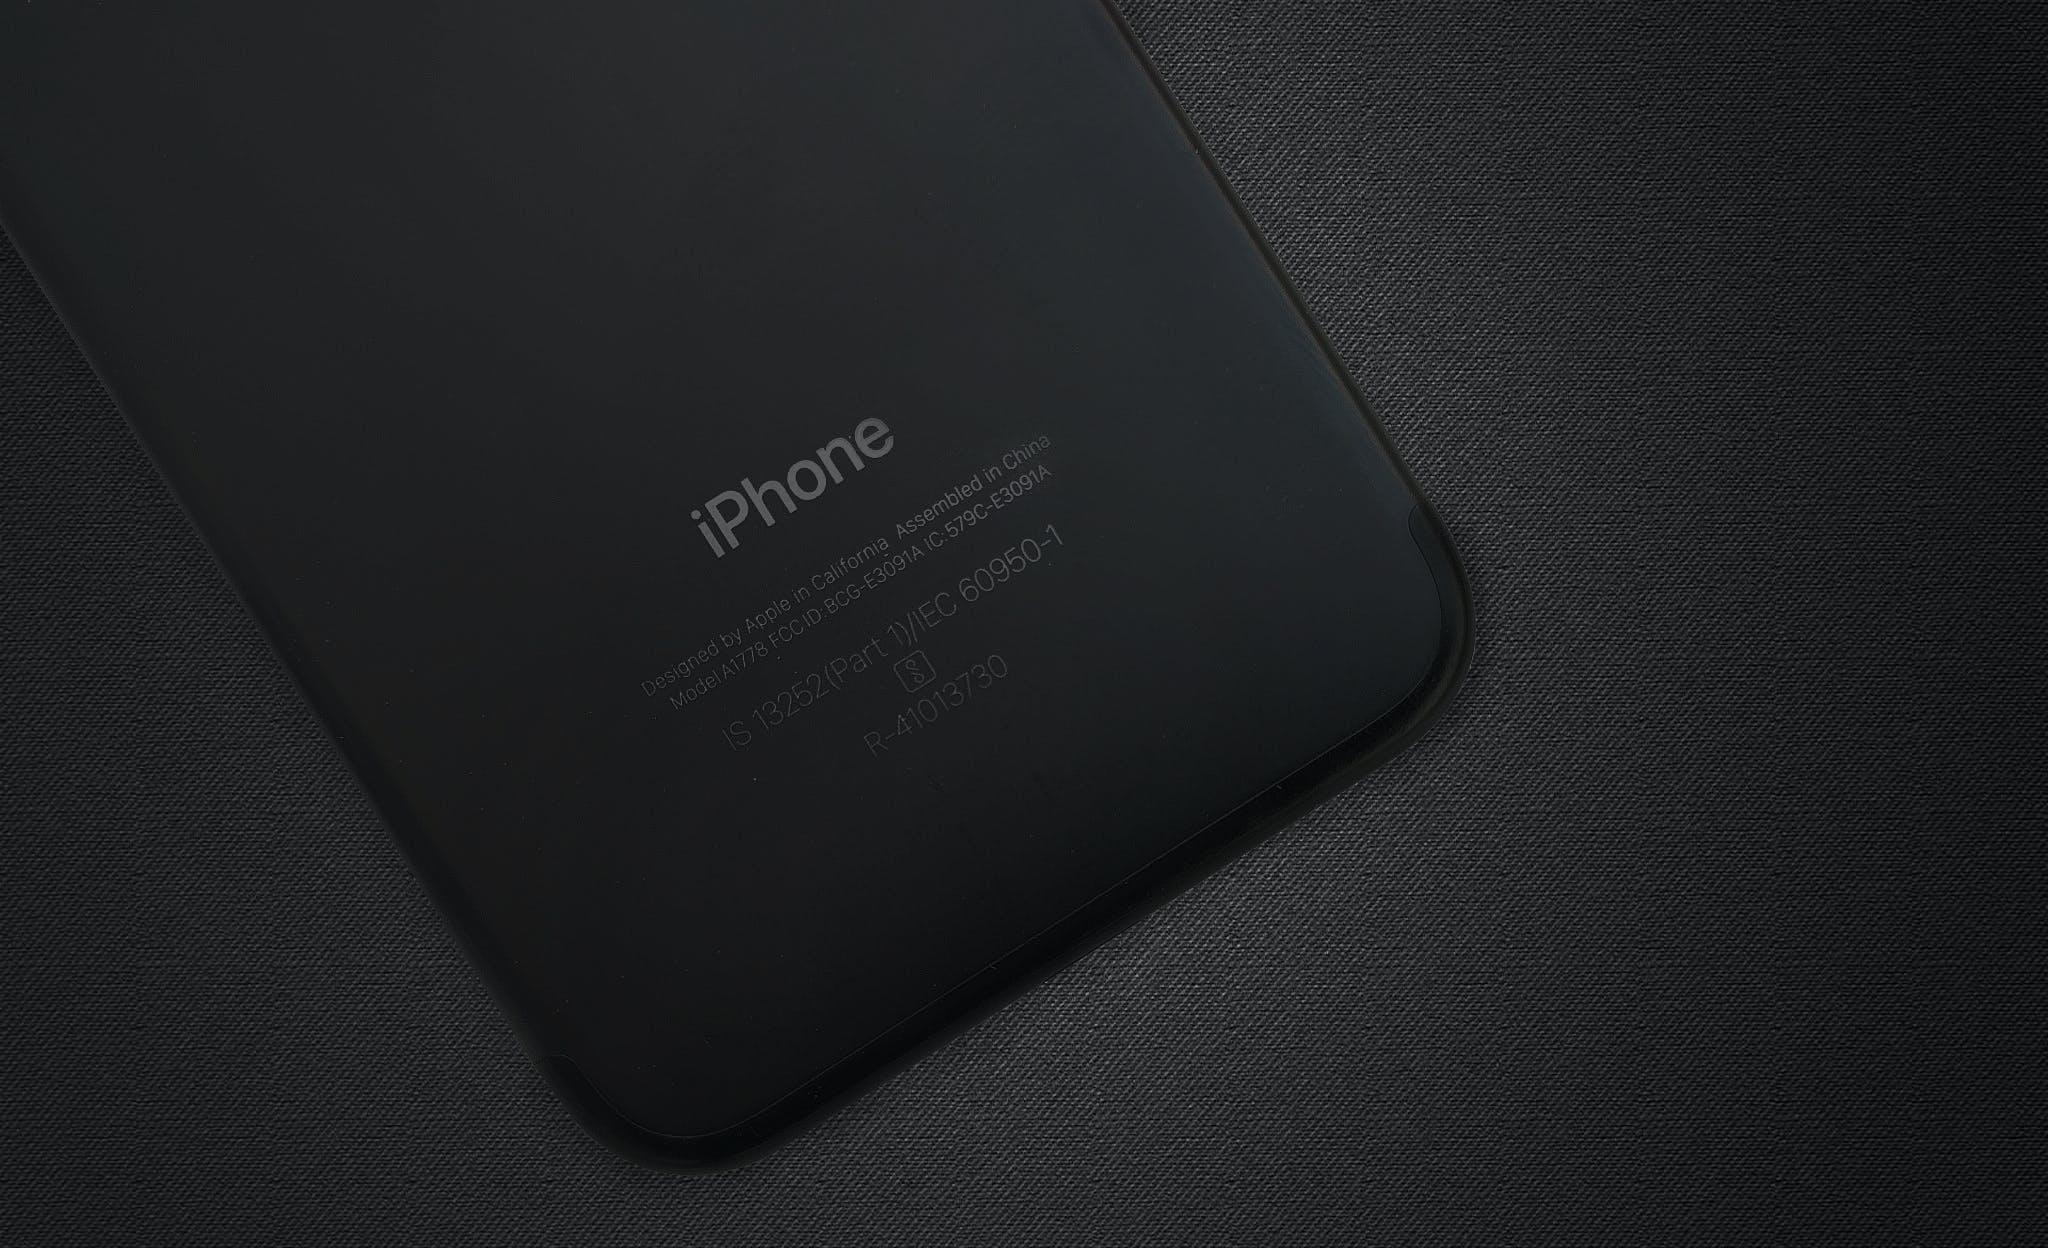 Free stock photo of beauty, dark, gadget, iphone